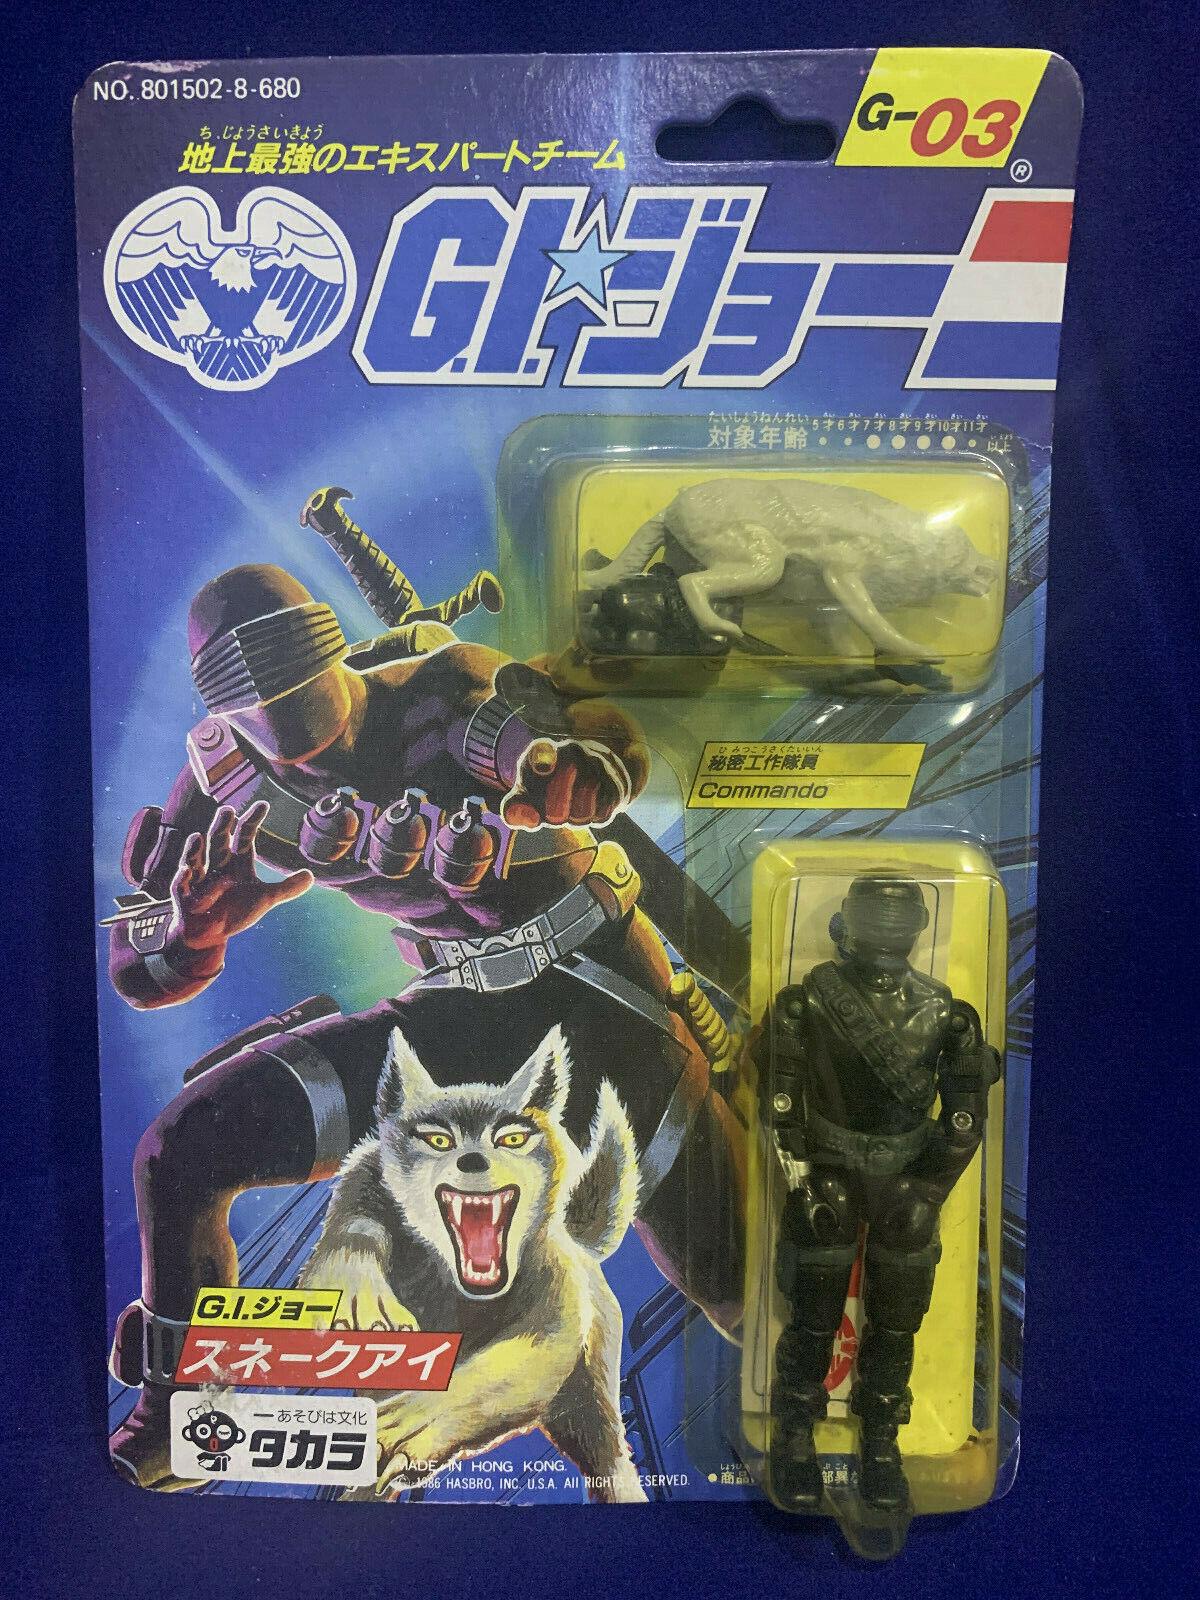 Takara Japan Vintage 1986 G03 GI G.I Joe 3  3 4 Snake Eyes Comhommedo + Timberwolf  contre authentique